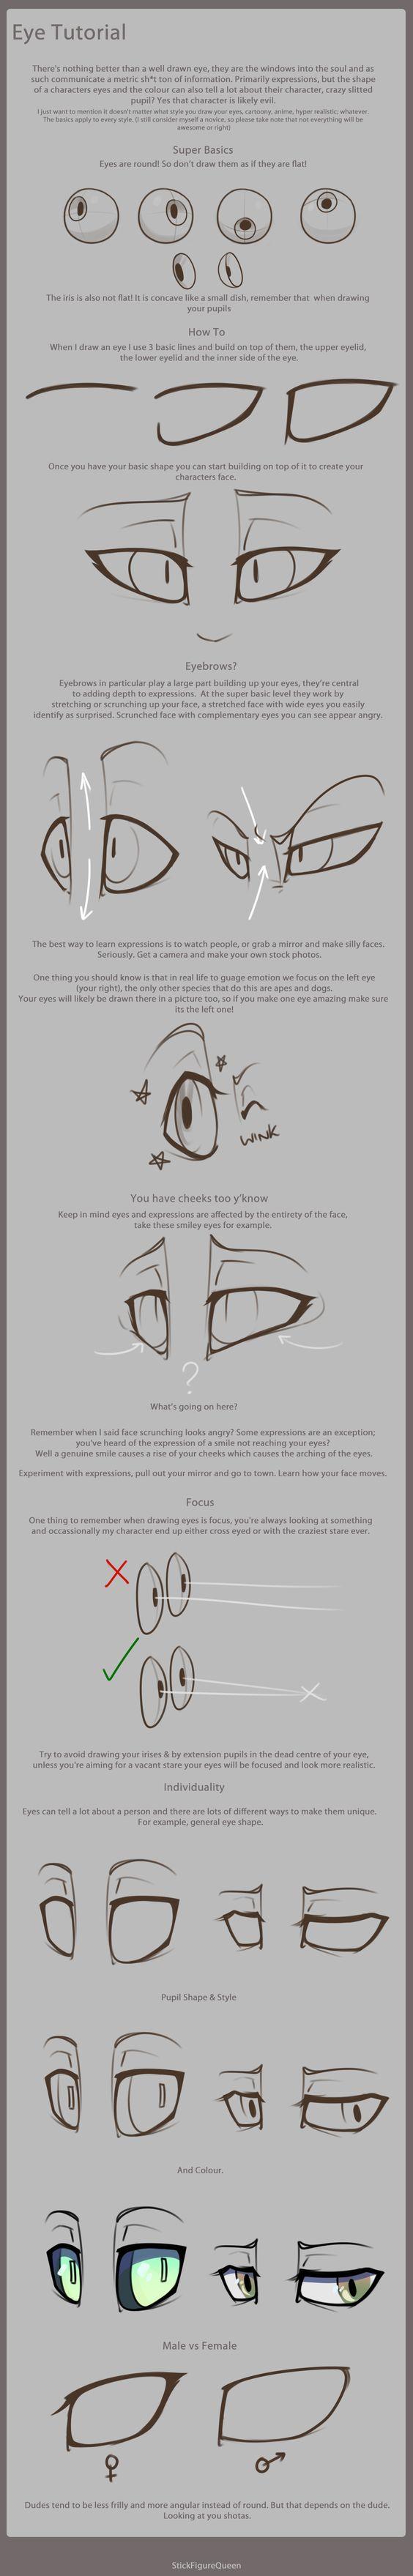 Character Design Eyes : Eye tutorial eyes and tutorials on pinterest